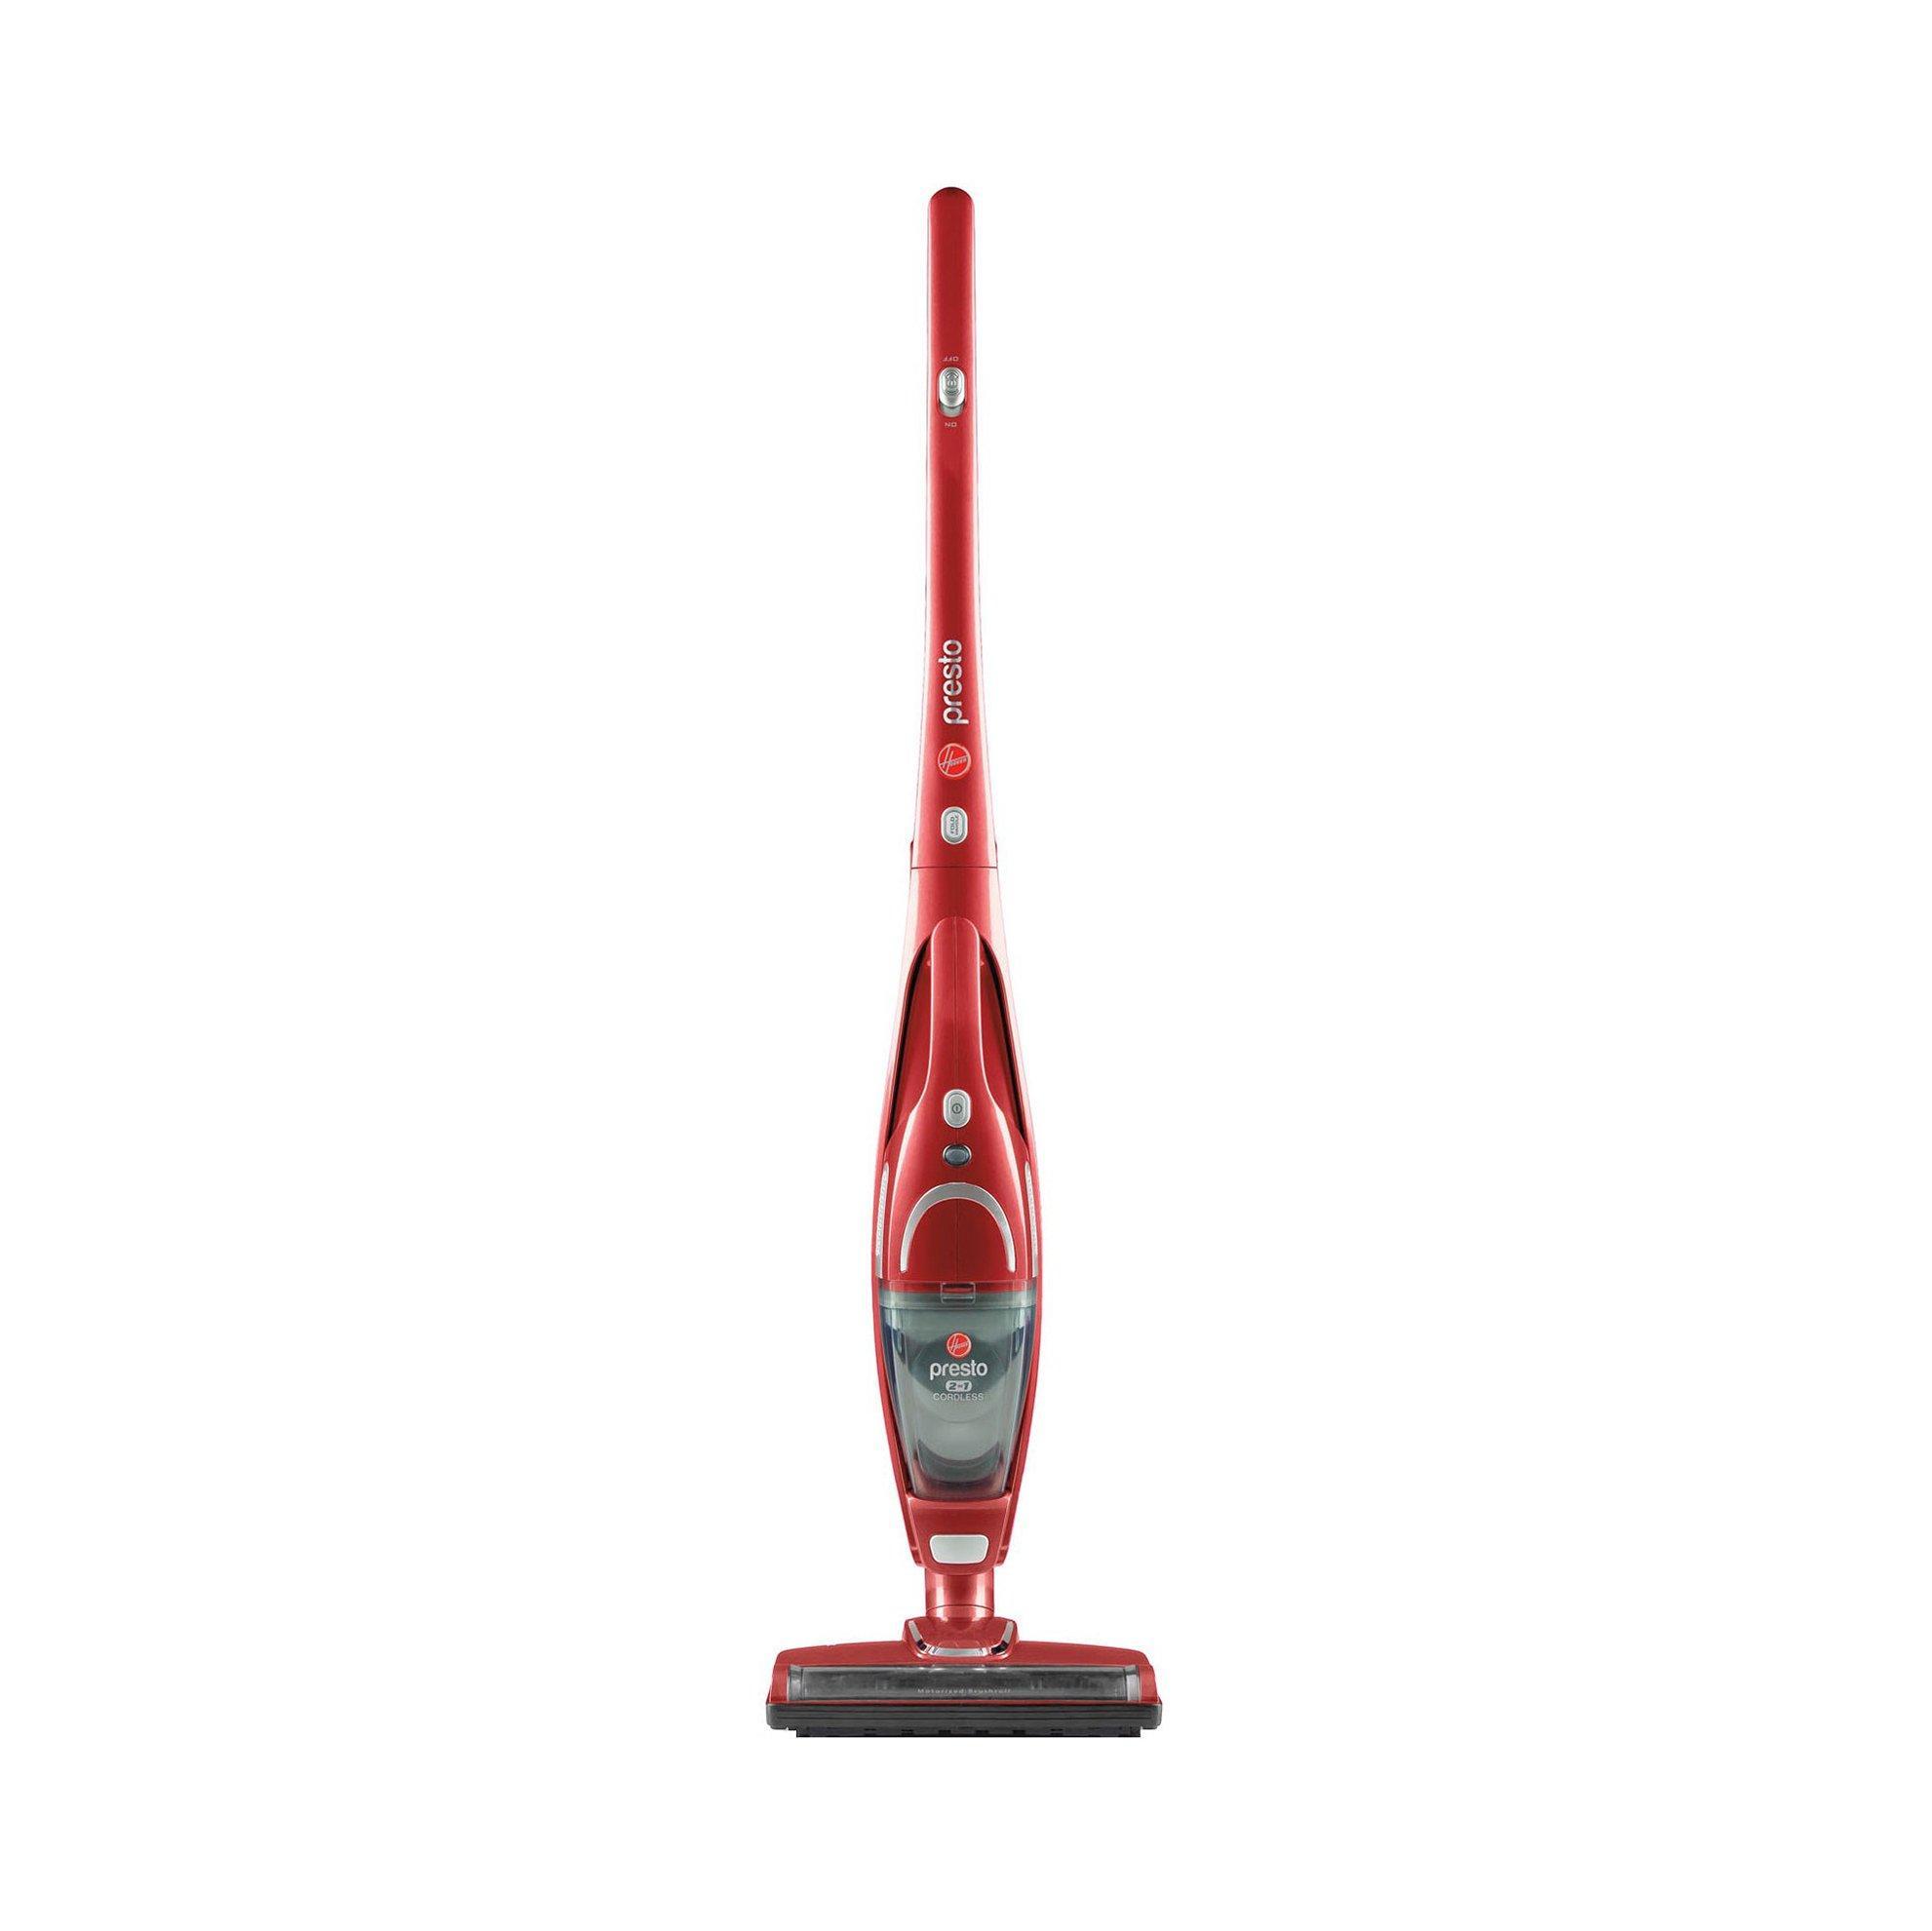 Reconditioned Presto 2-in-1 Cordless Stick Vacuum